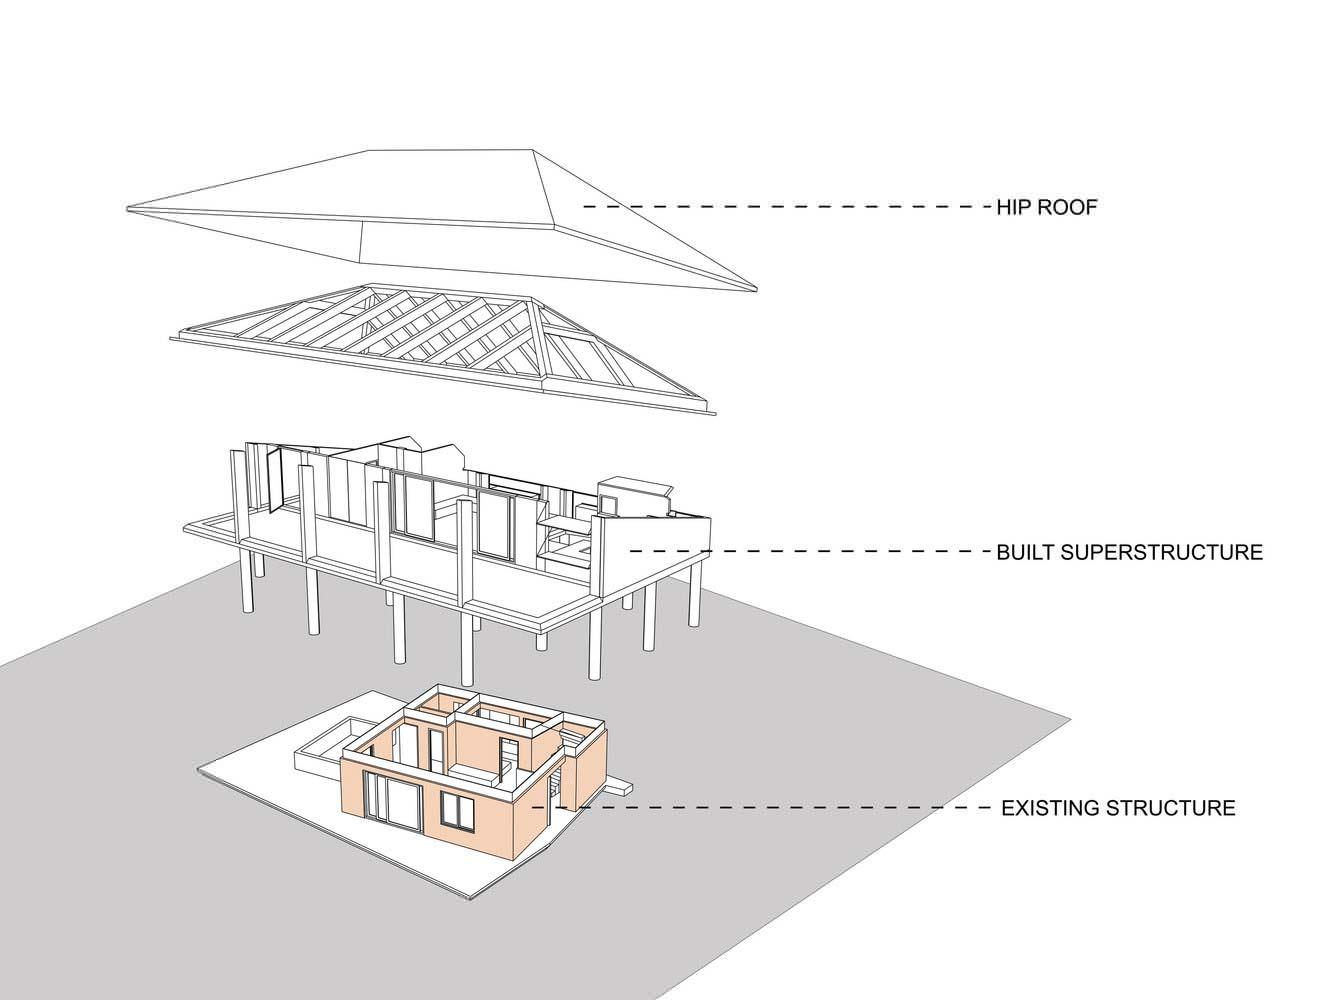 Проект расширения дома от PLAYGROUP Studio